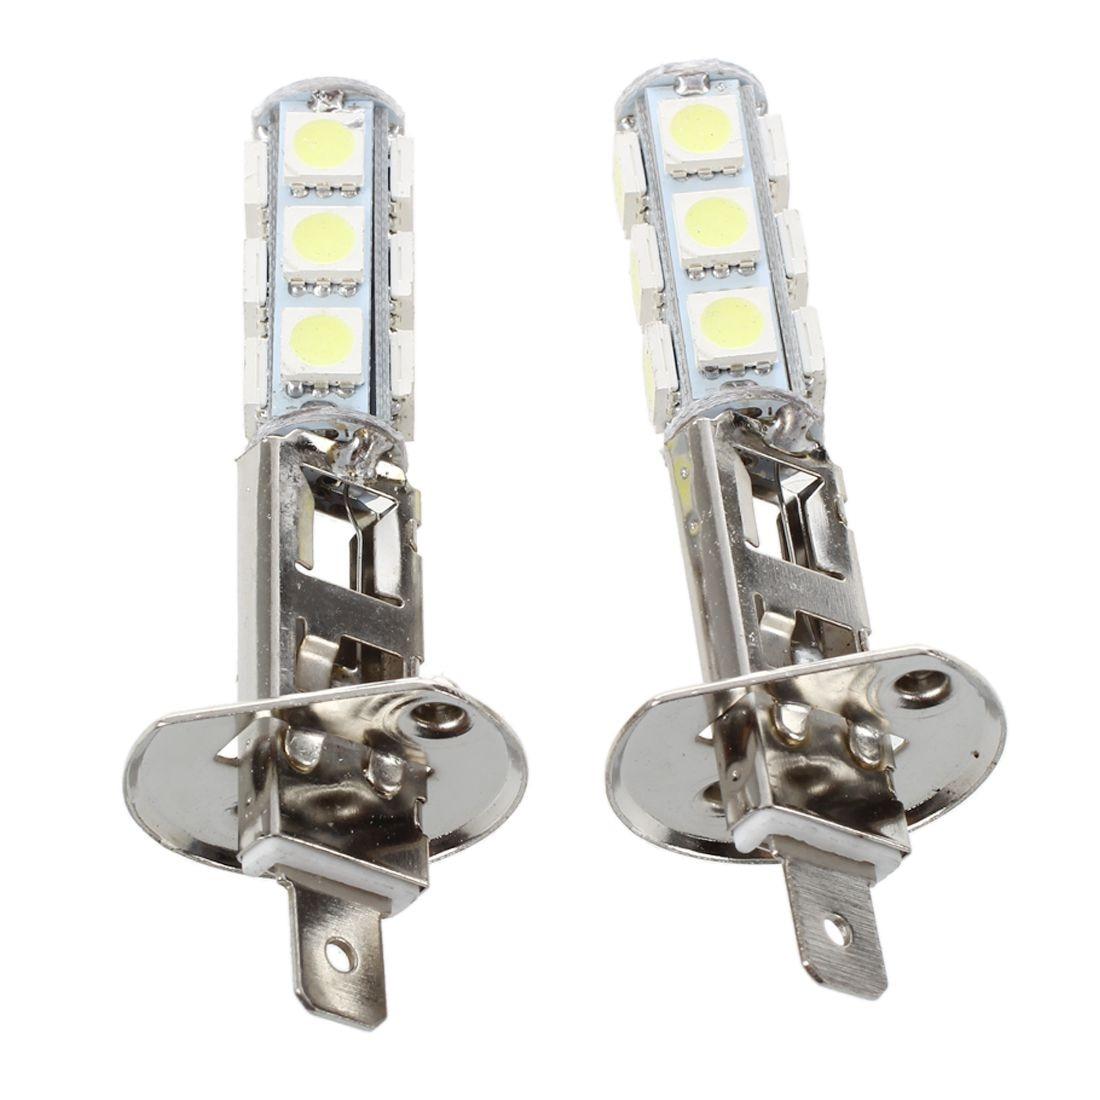 2 Pcs Auto Light Headlight Lamp H1 White 13 SMD 5050 LED Chips